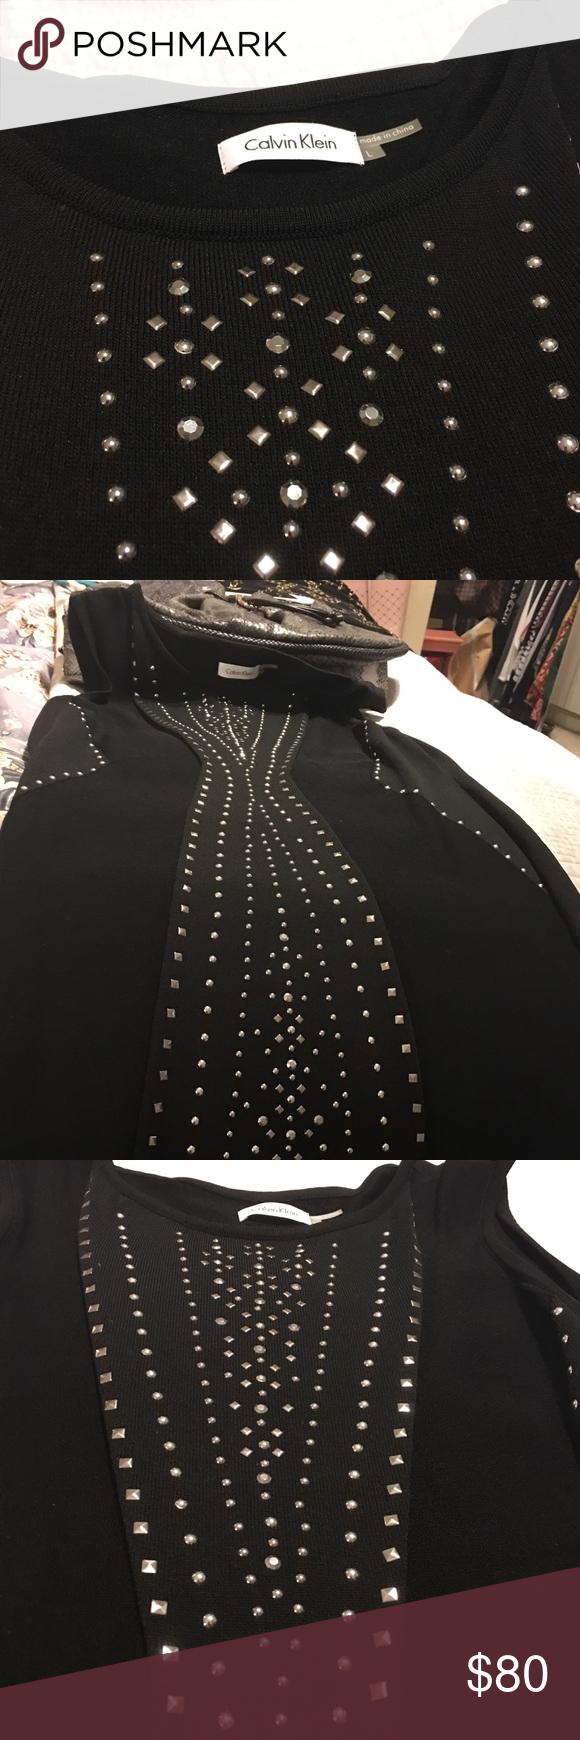 df3fdd884b Black Calvin s Klein knit dress with silver studs Black knit dress never  worn silver studs Calvin